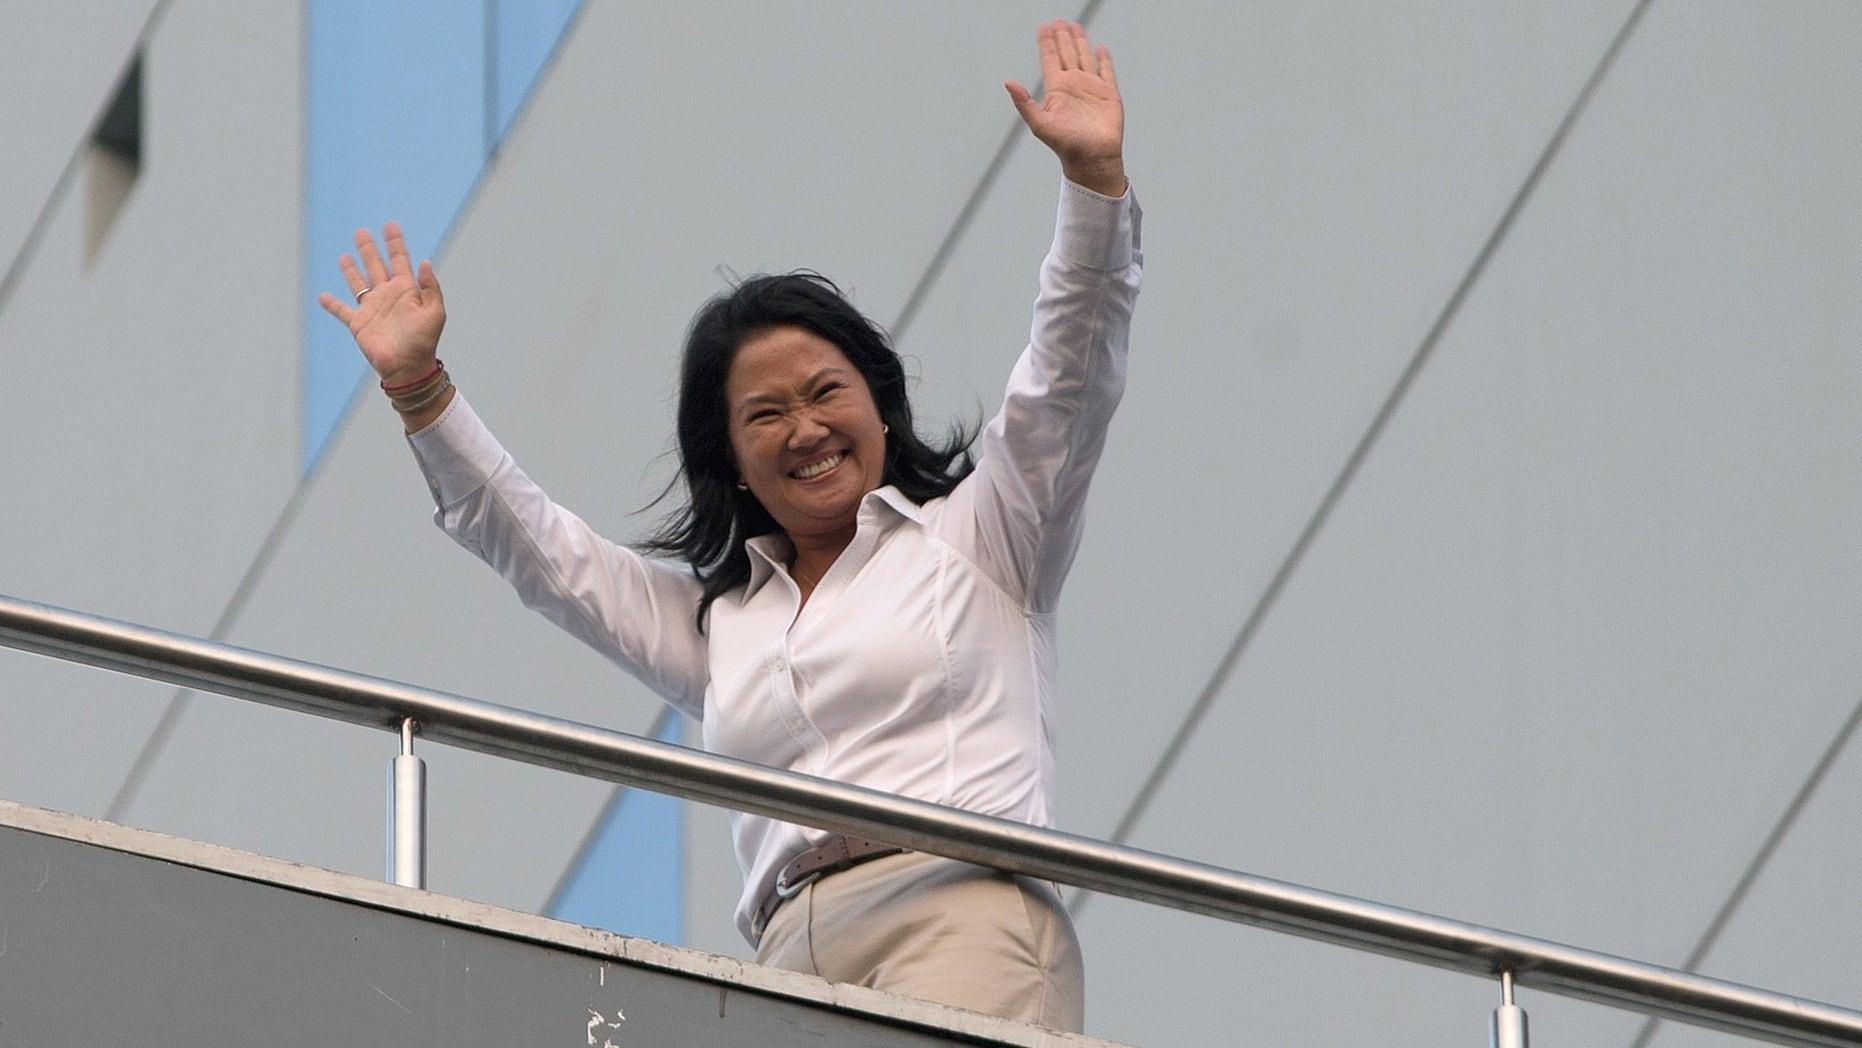 Presidential candidate Keiko Fujimori in Lima, Peru, Sunday, April 10, 2016.